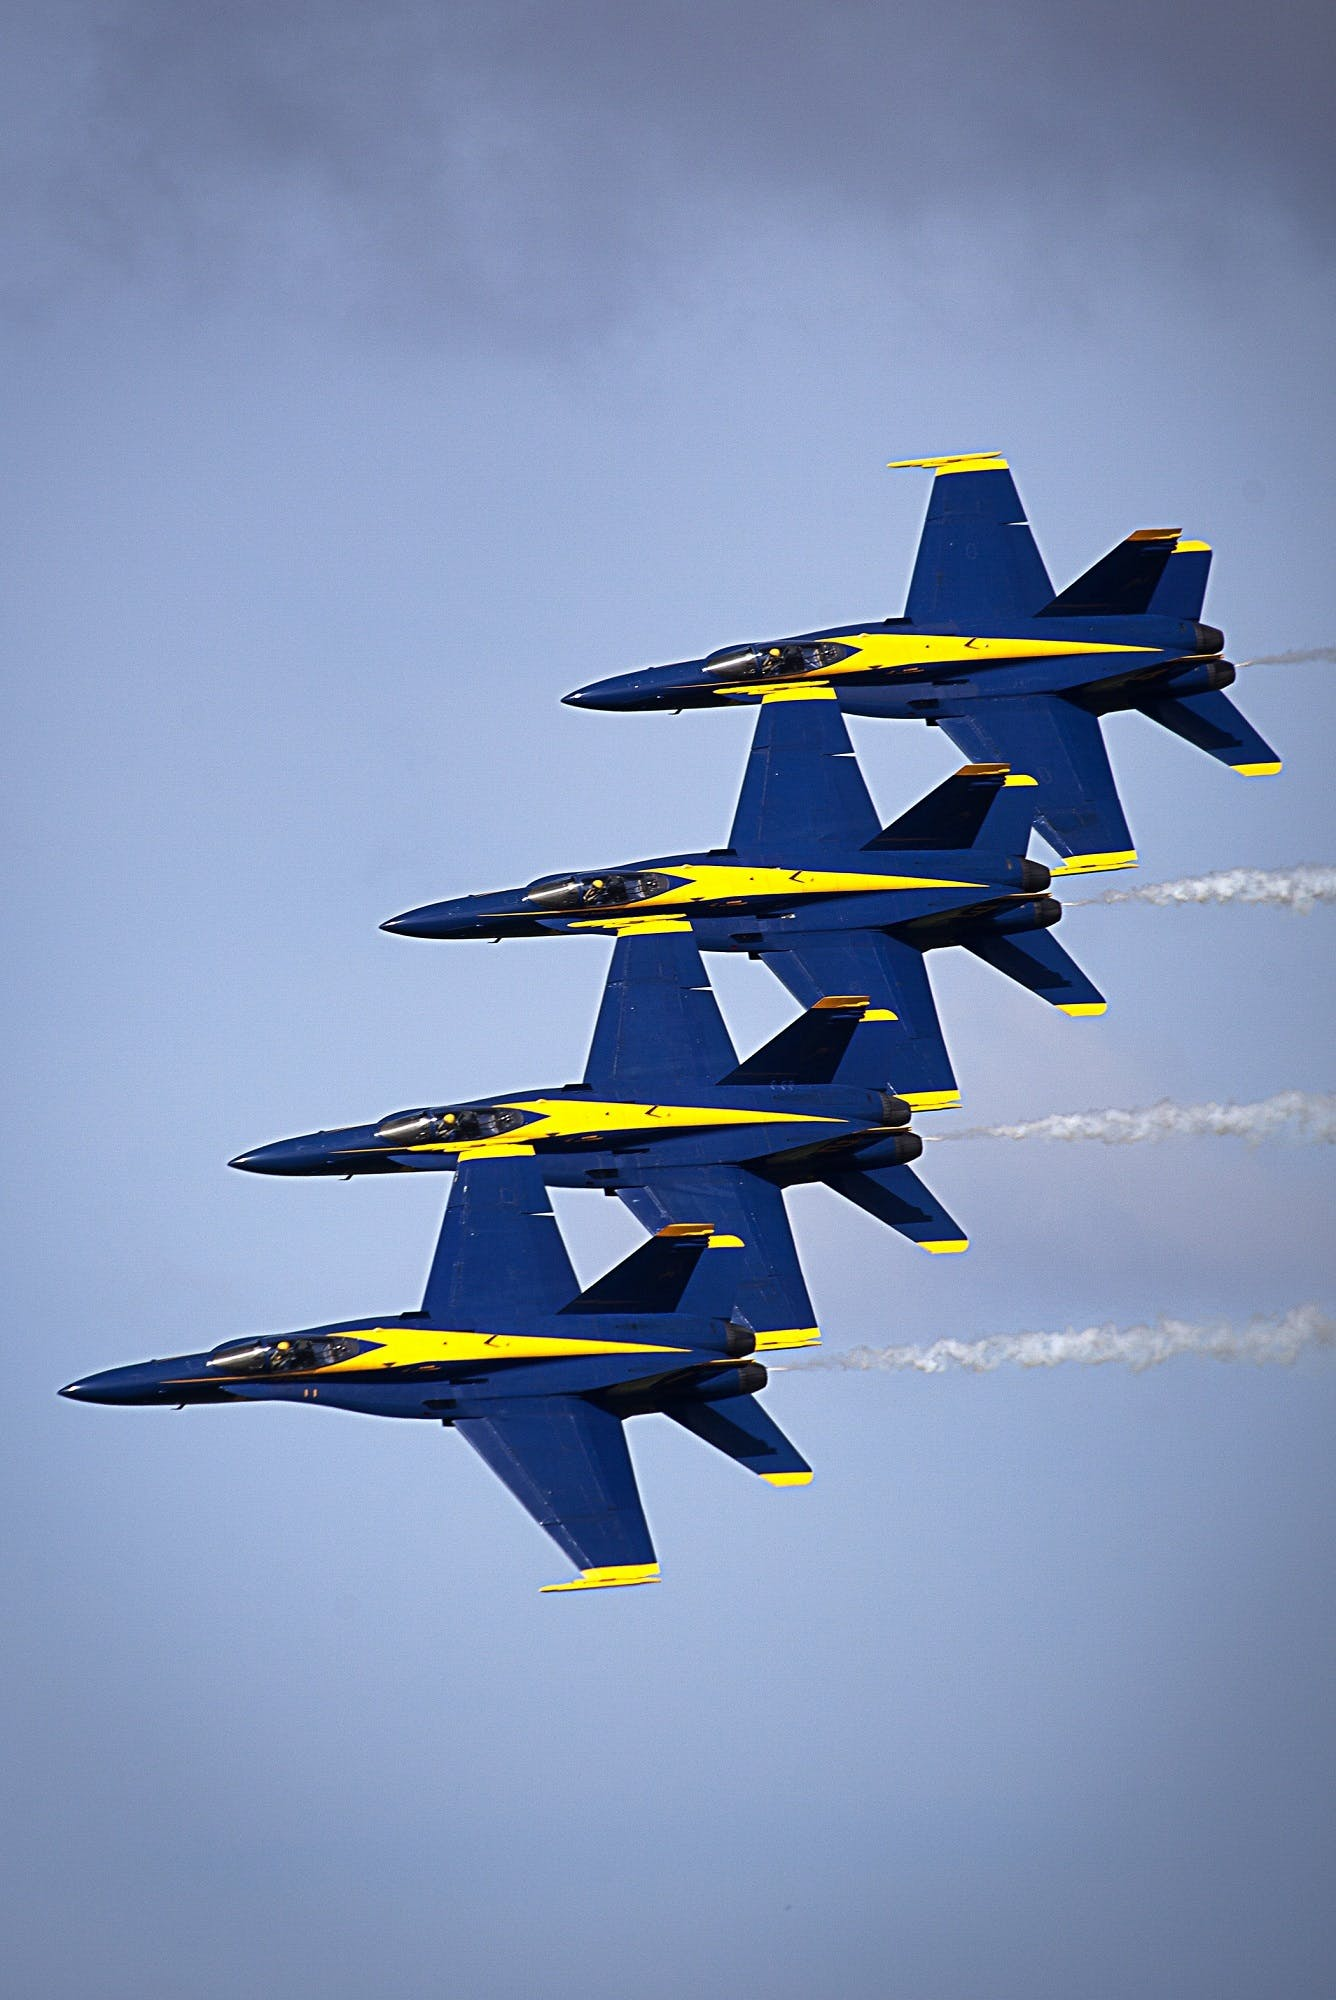 aerobatics, aircraft, airplanes